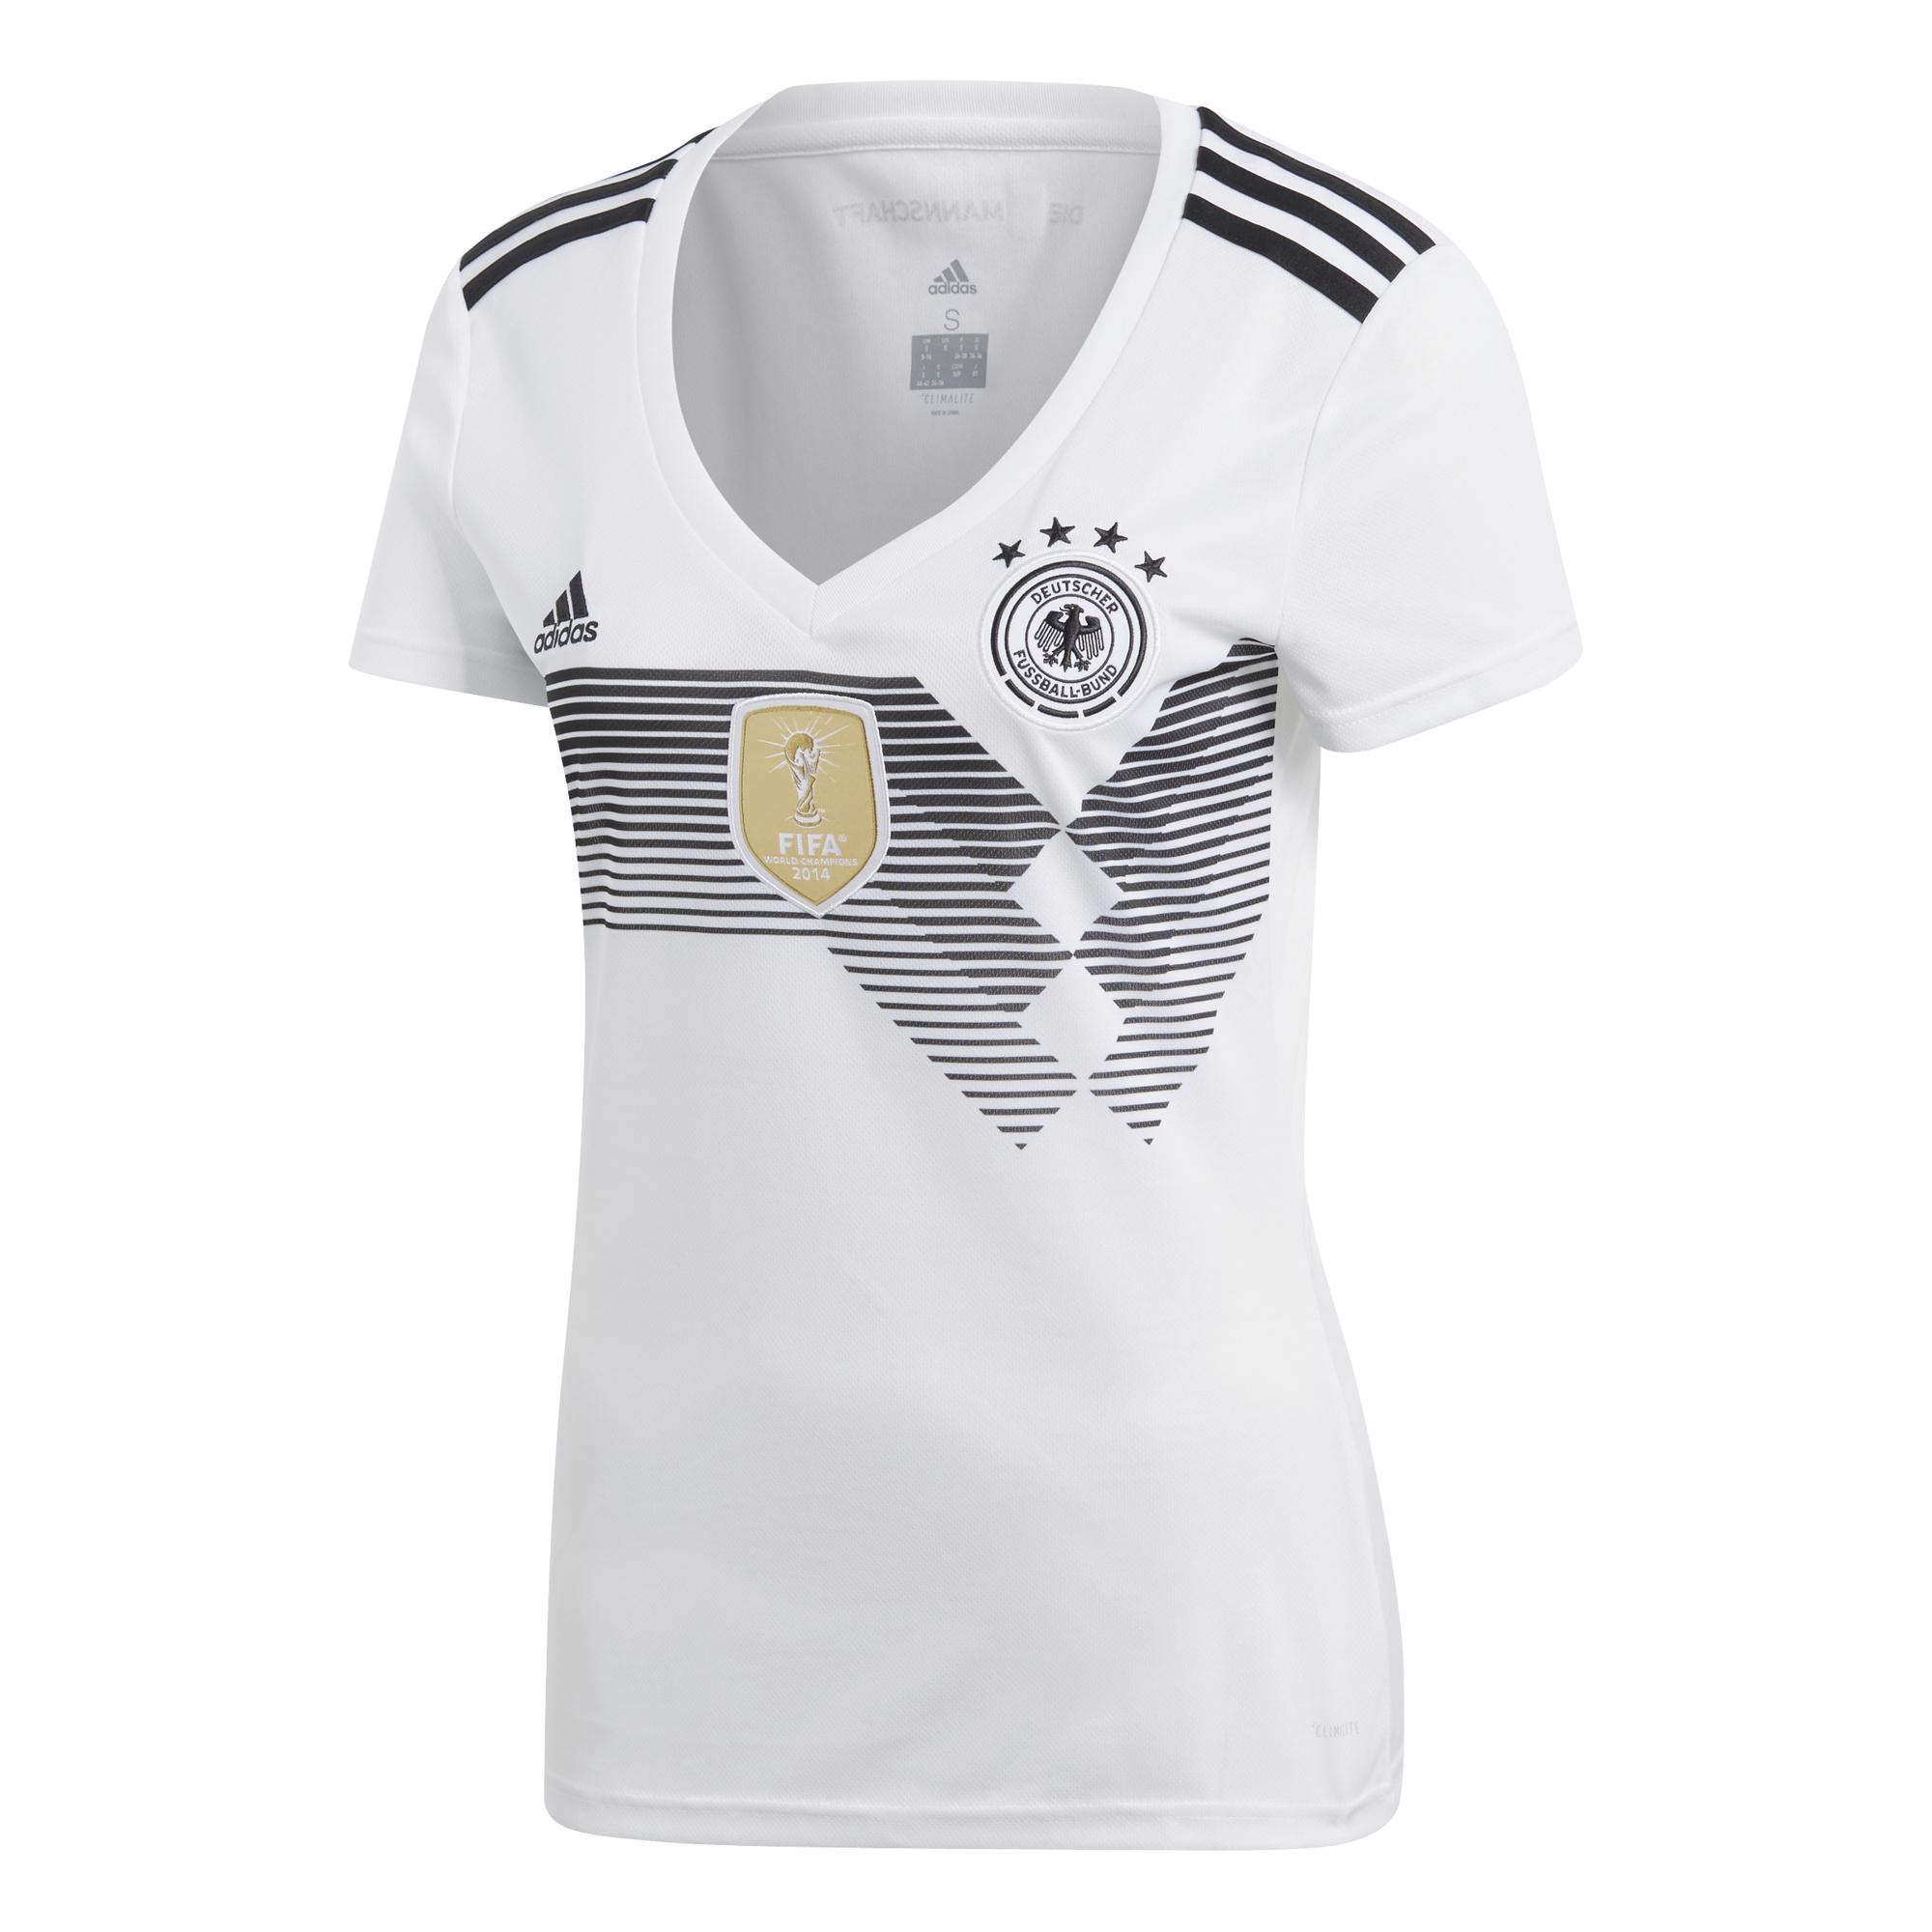 adidas Performance | adidas DFB Trikot Home Hector WM 2018